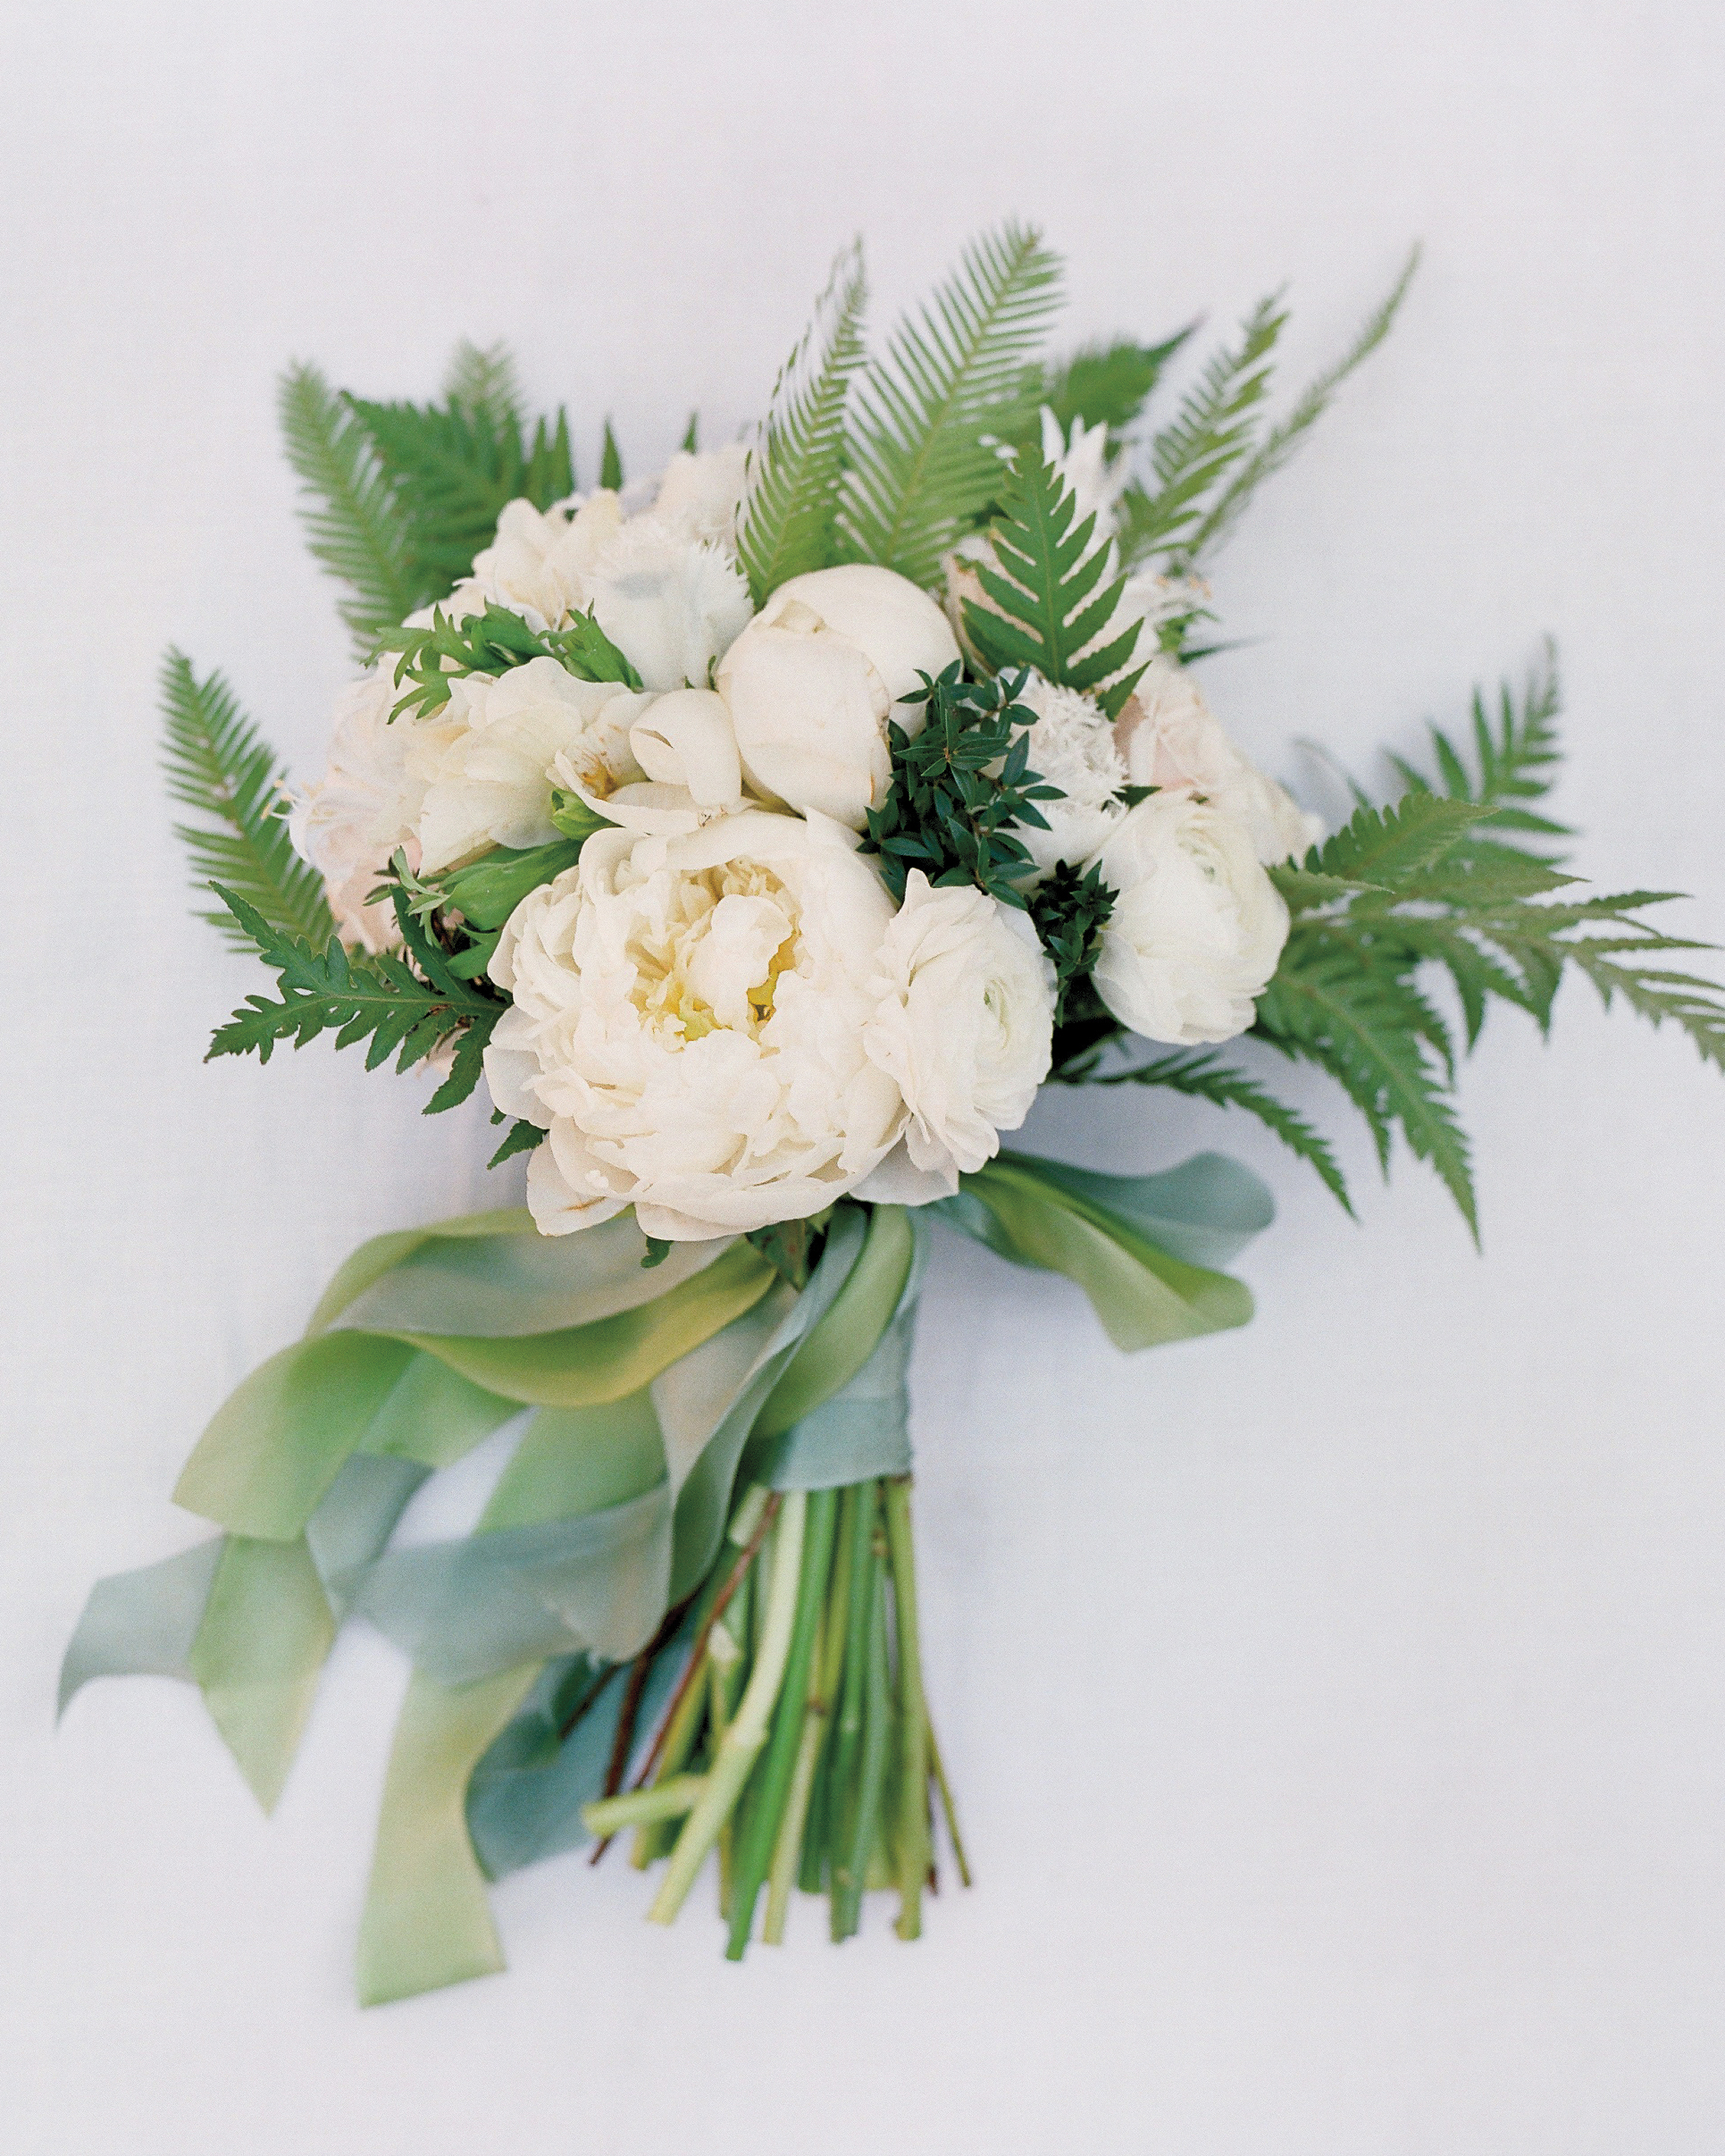 adriana-han-wedding-58250014-s111814.jpg